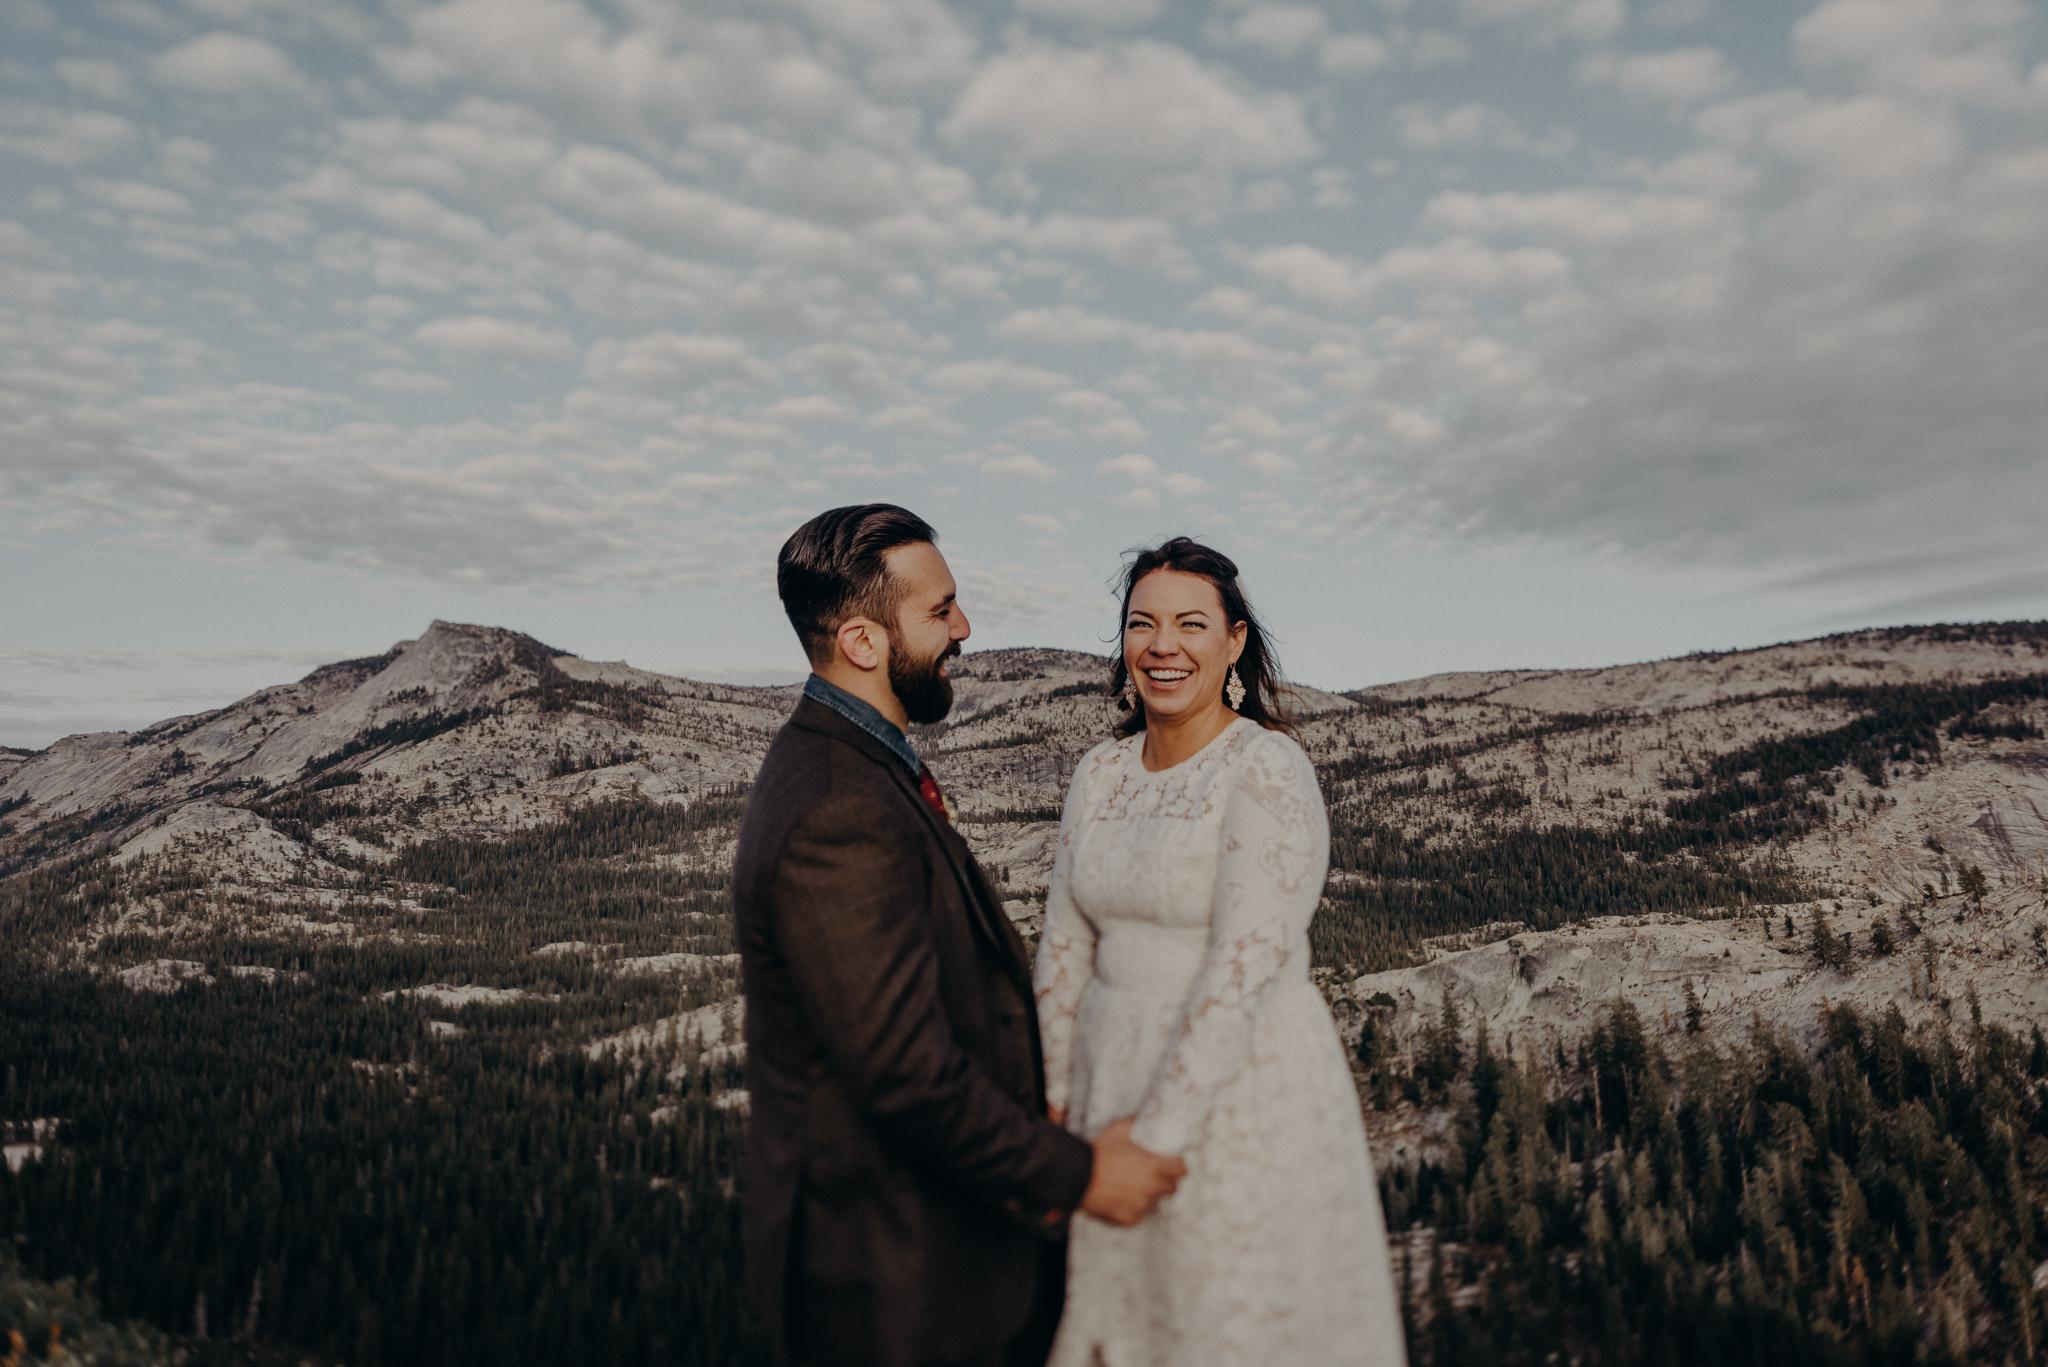 Yosemite Elopement Photographer - Evergreen Lodge Wedding Photographer - IsaiahAndTaylor.com-024.jpg